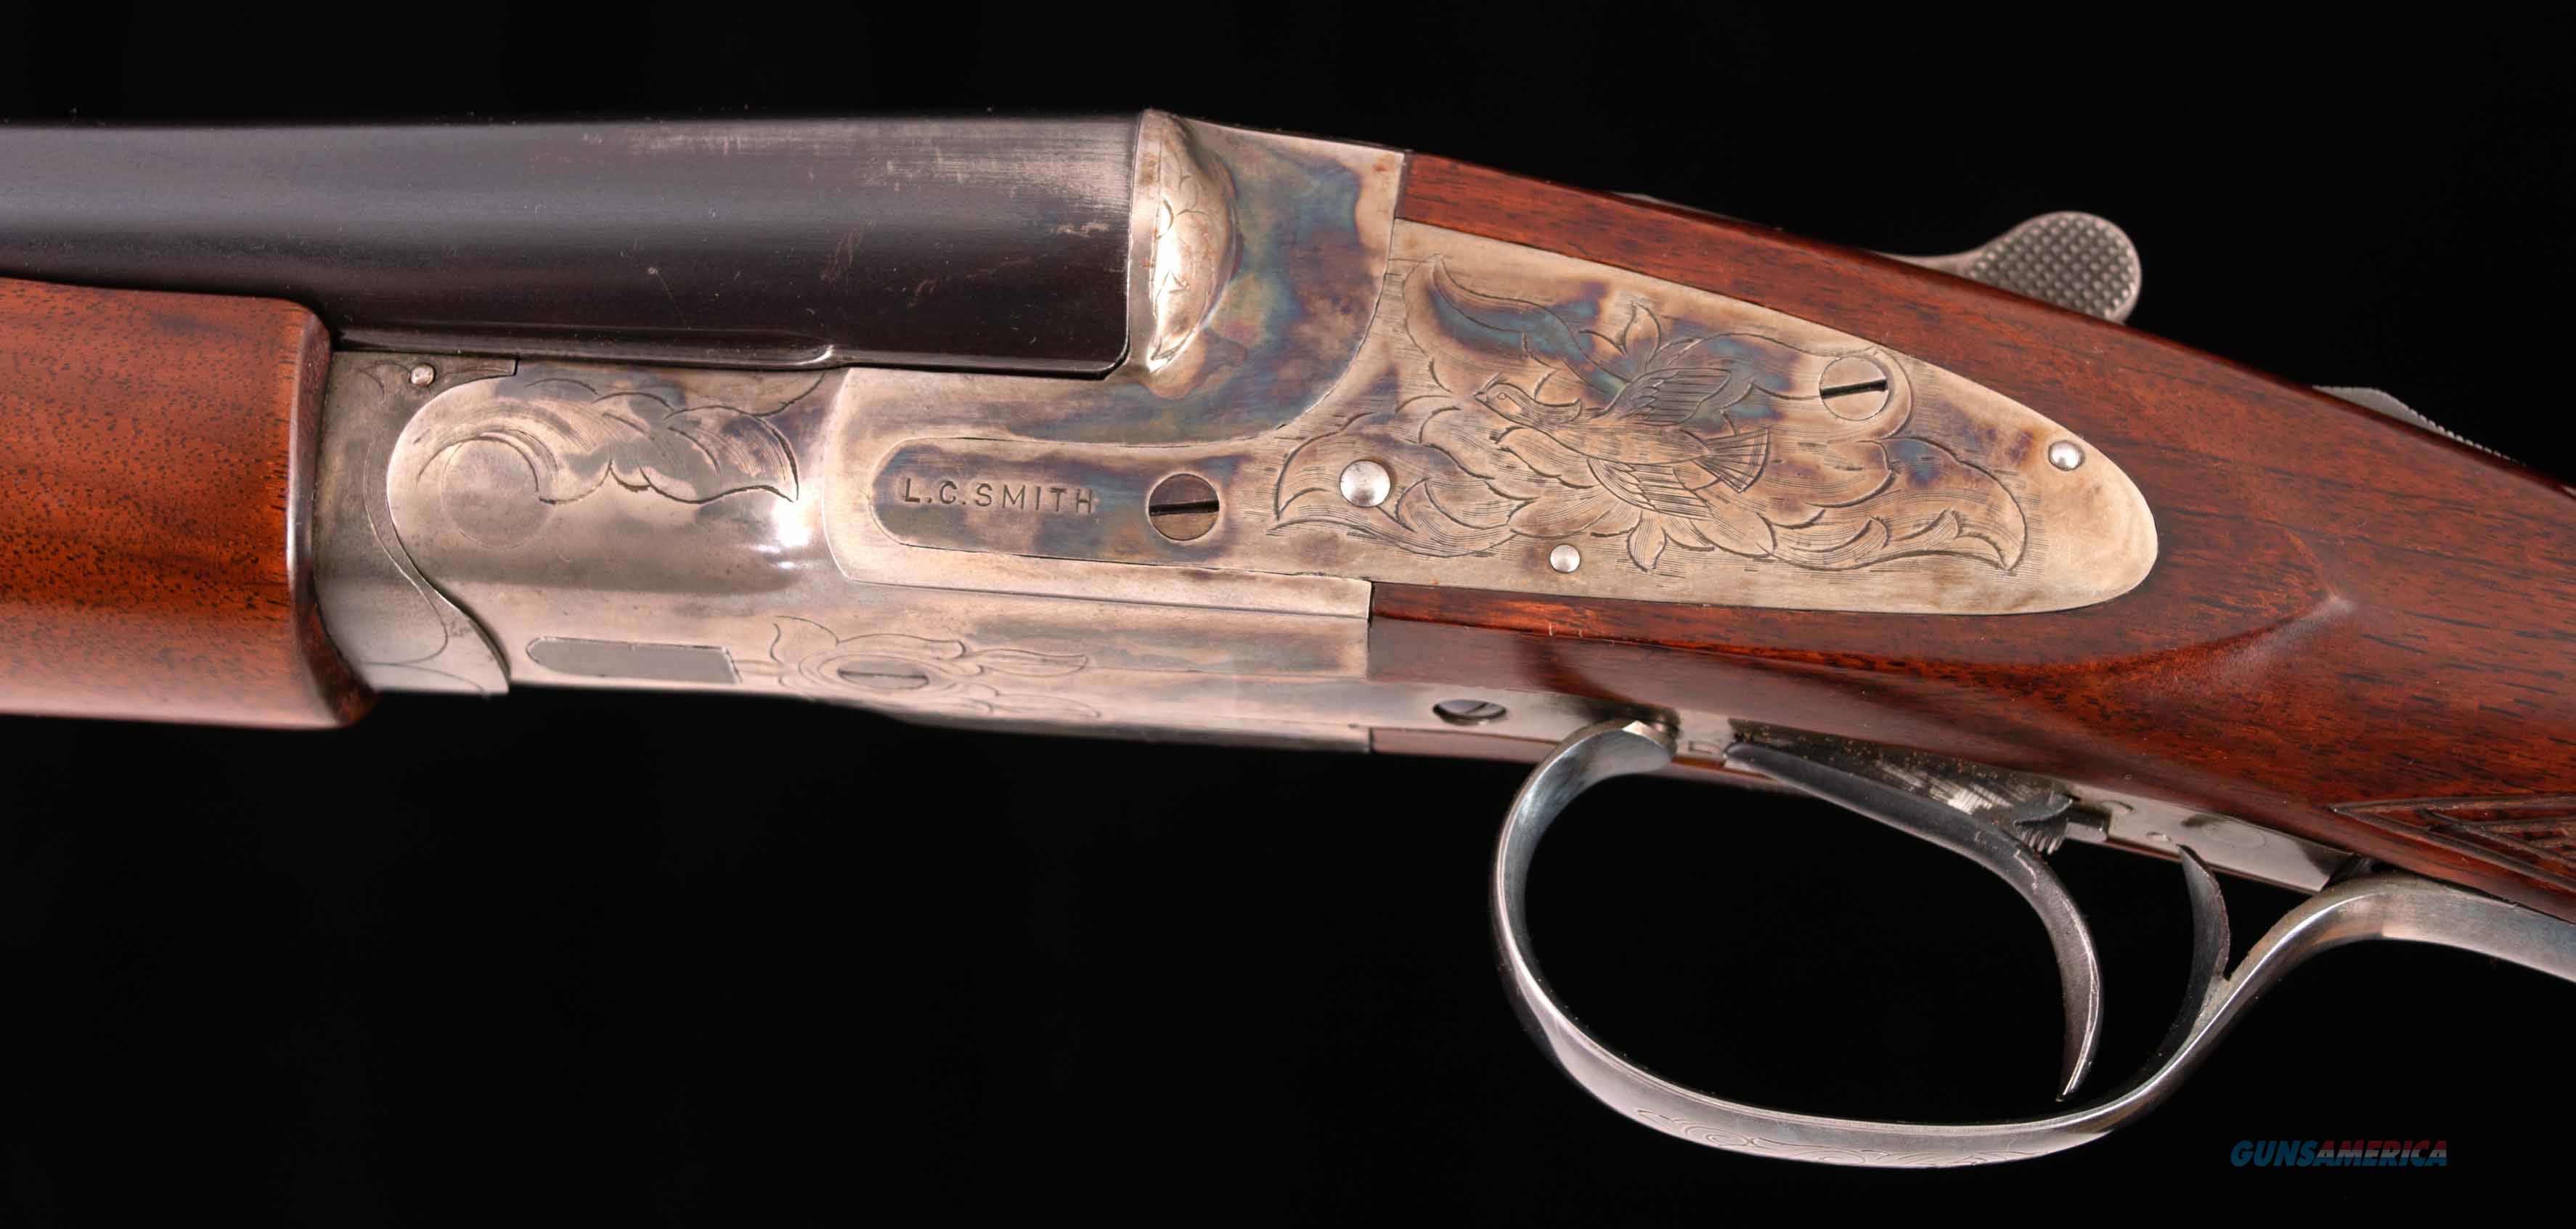 L.C. Smith Premier Skeet 20ga.- 1 of 77 MADE, RARE, vintage firearms inc   Guns > Shotguns > L.C. Smith Shotguns